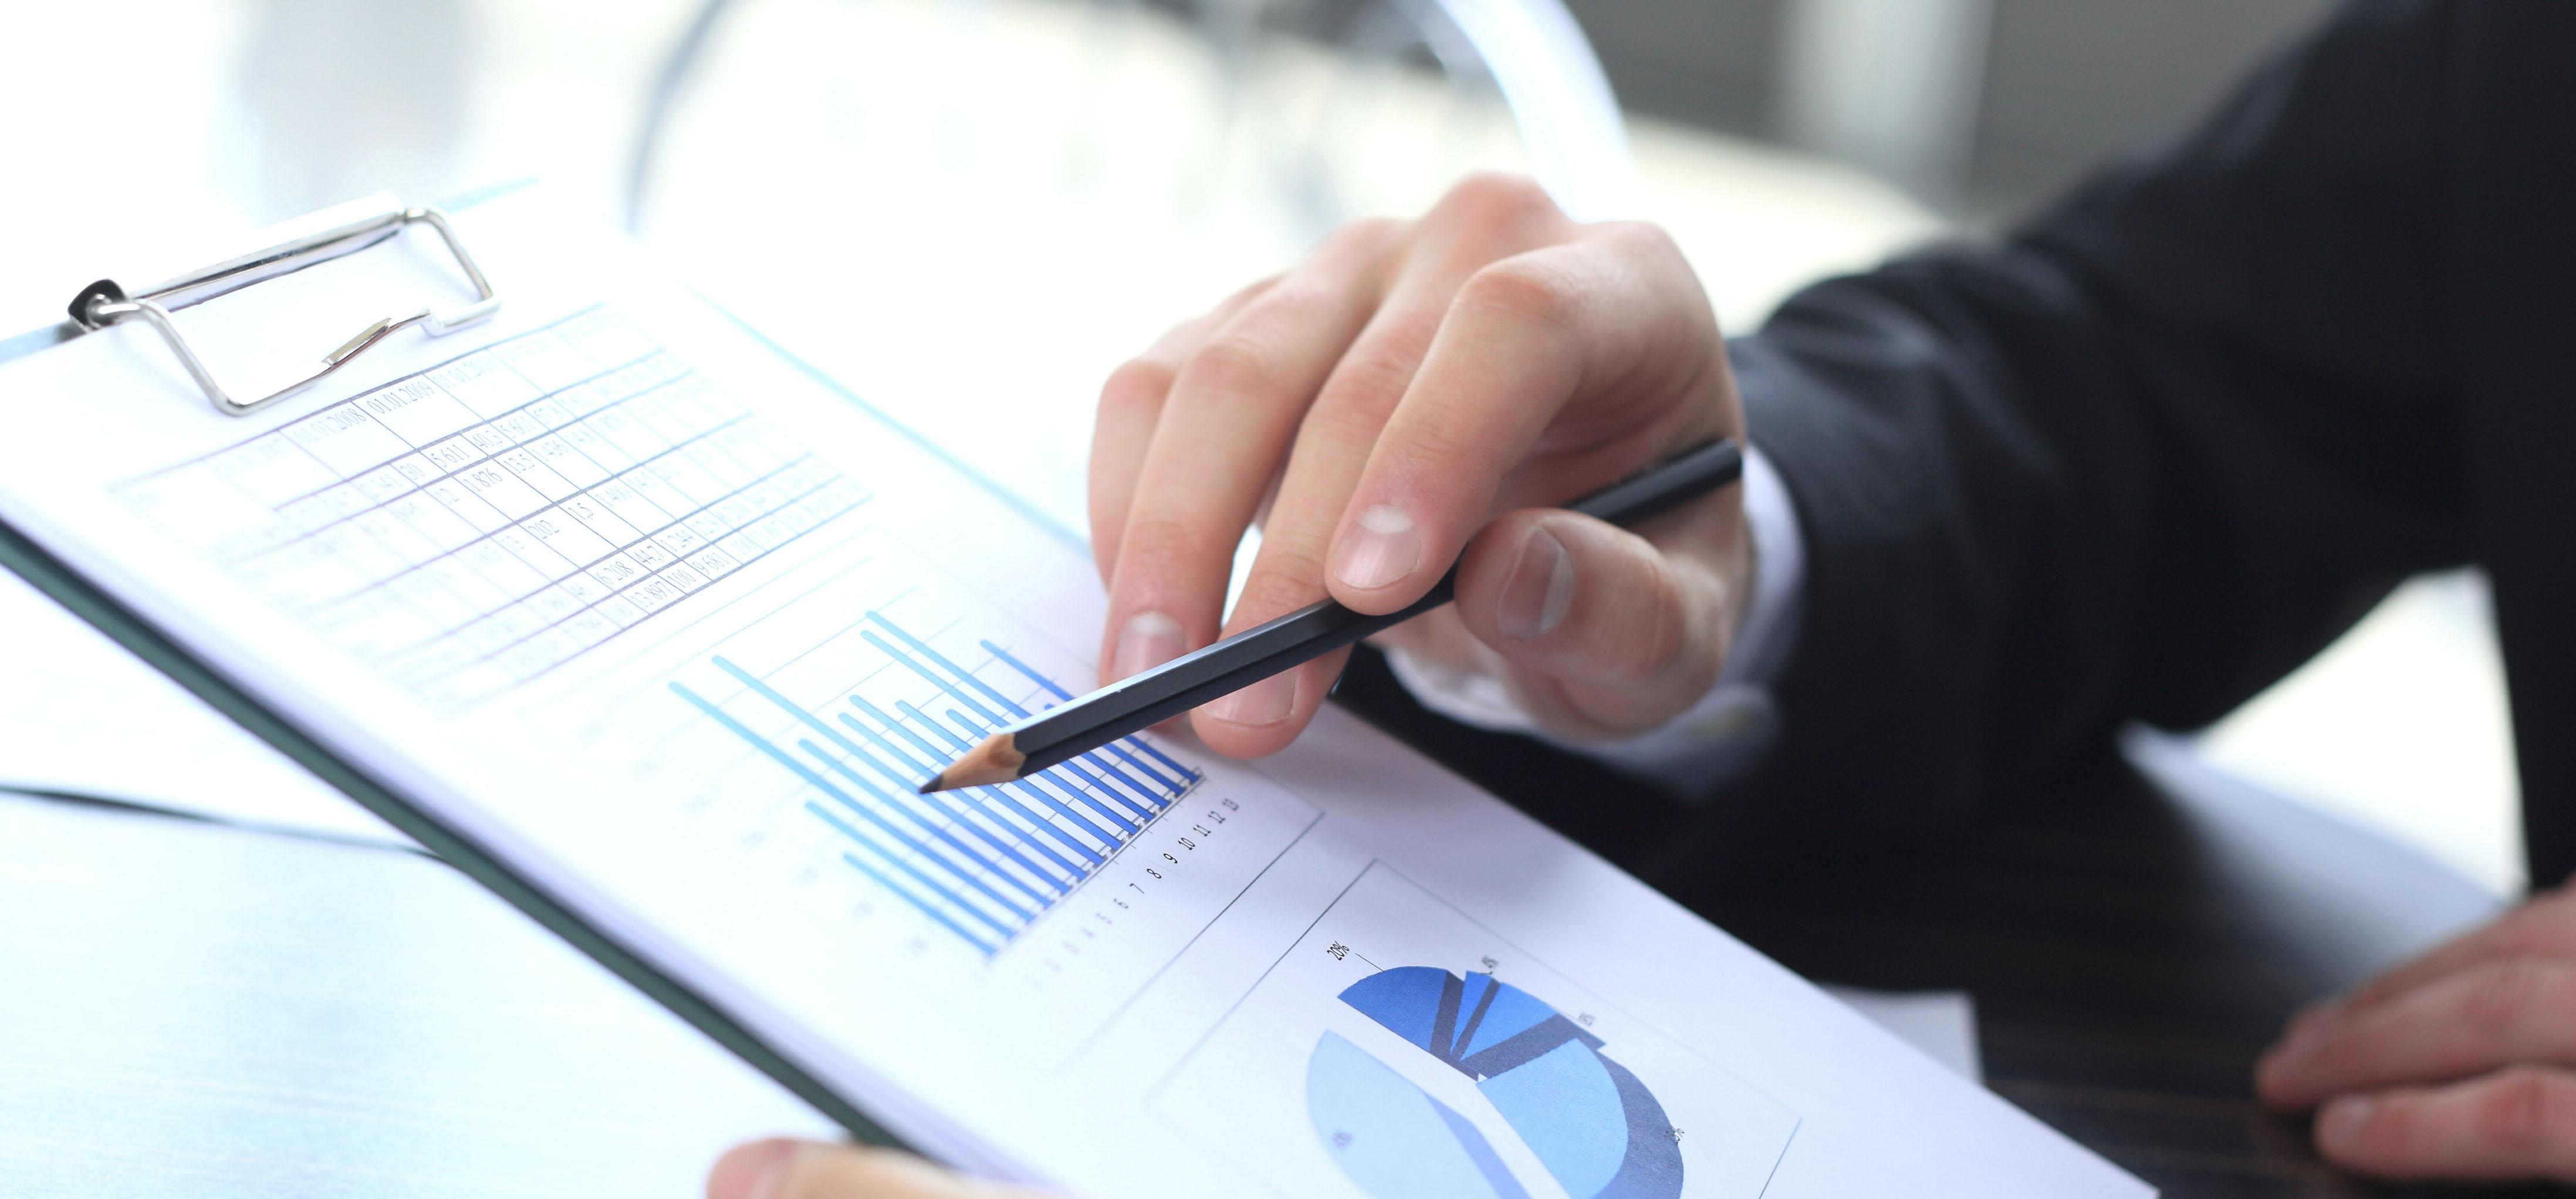 Benchmarking-benefits.jpg#asset:16249